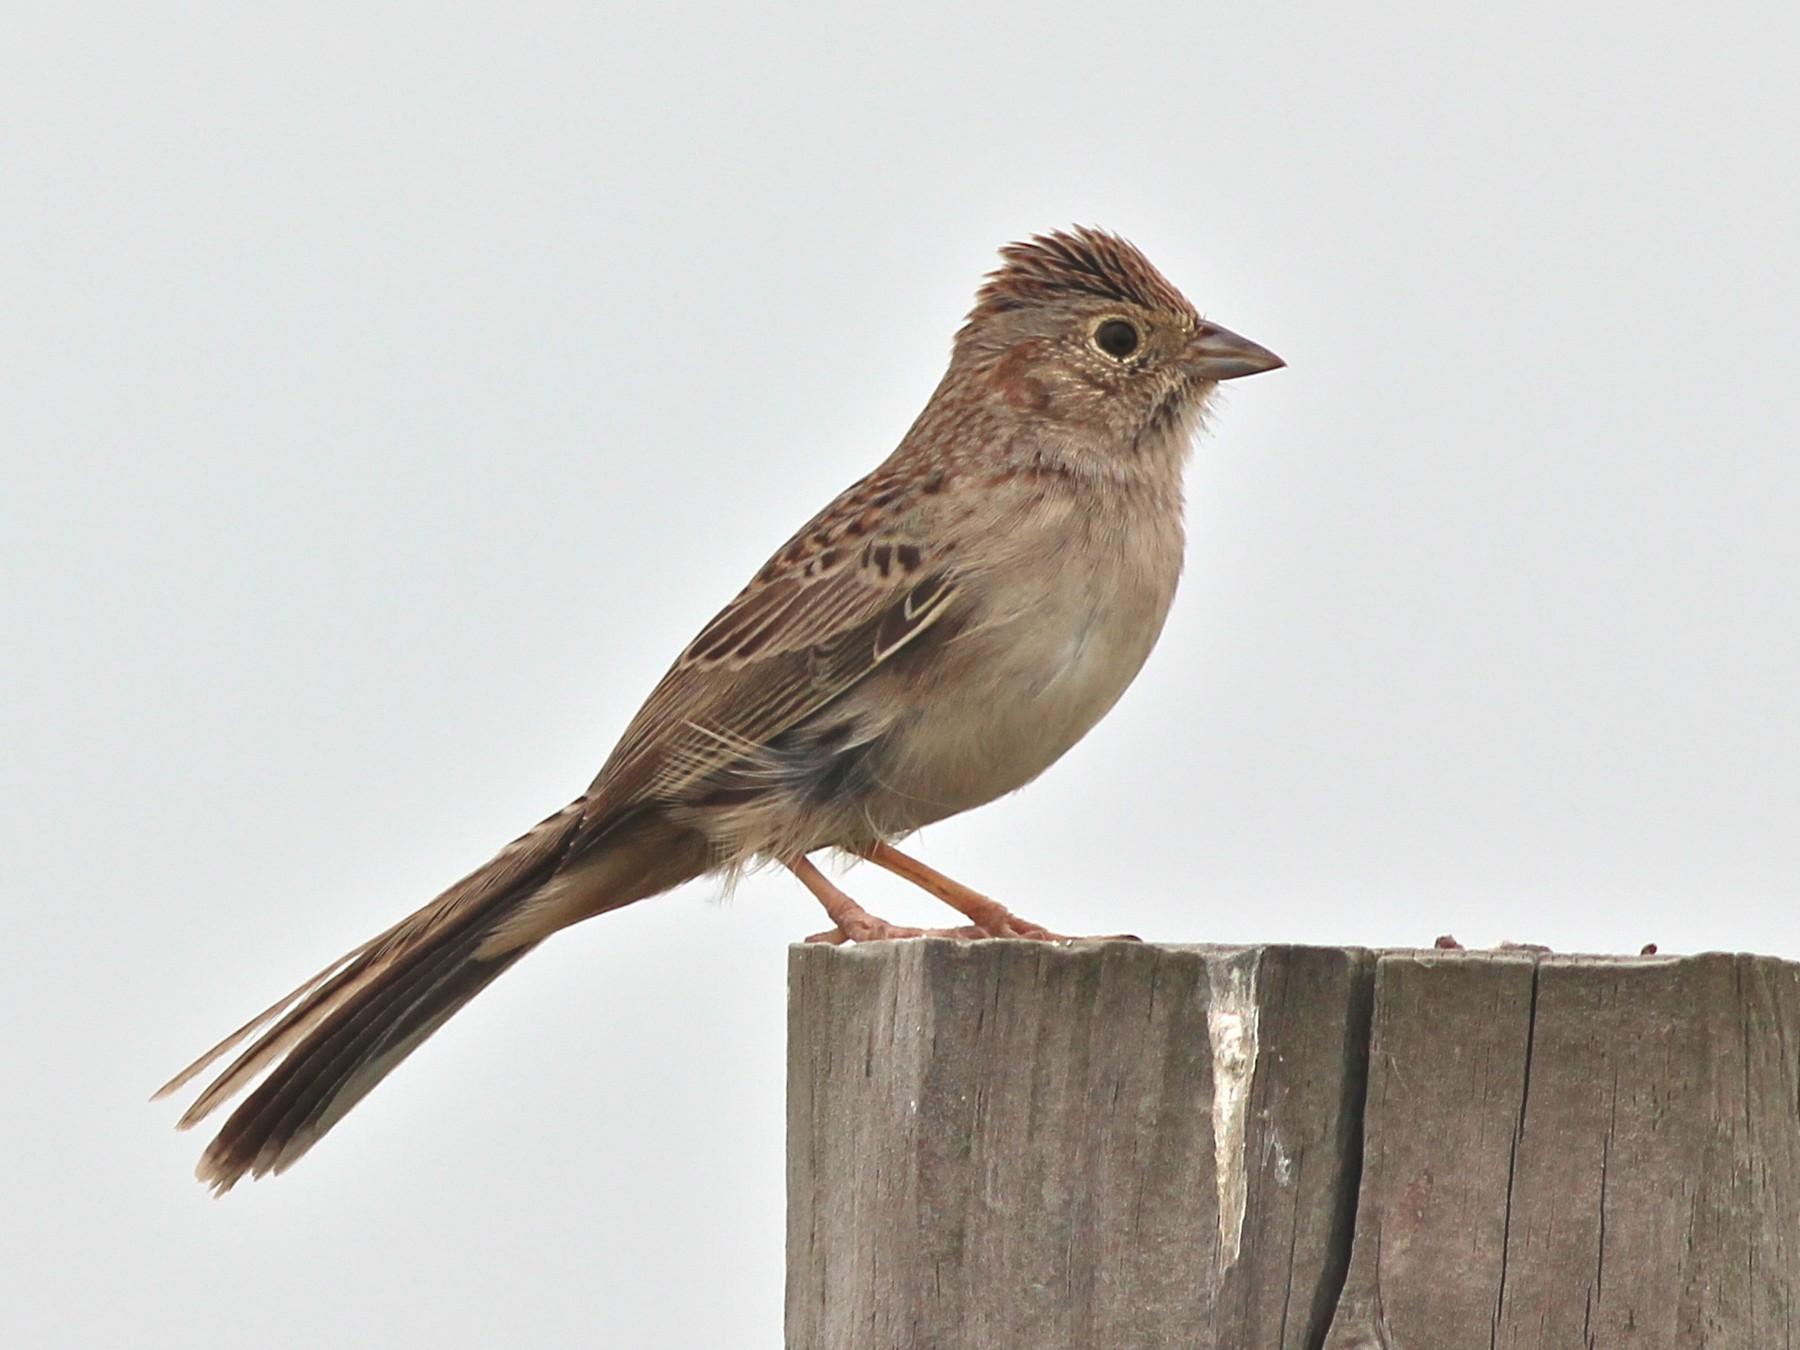 Cassin's Sparrow - Shawn Billerman